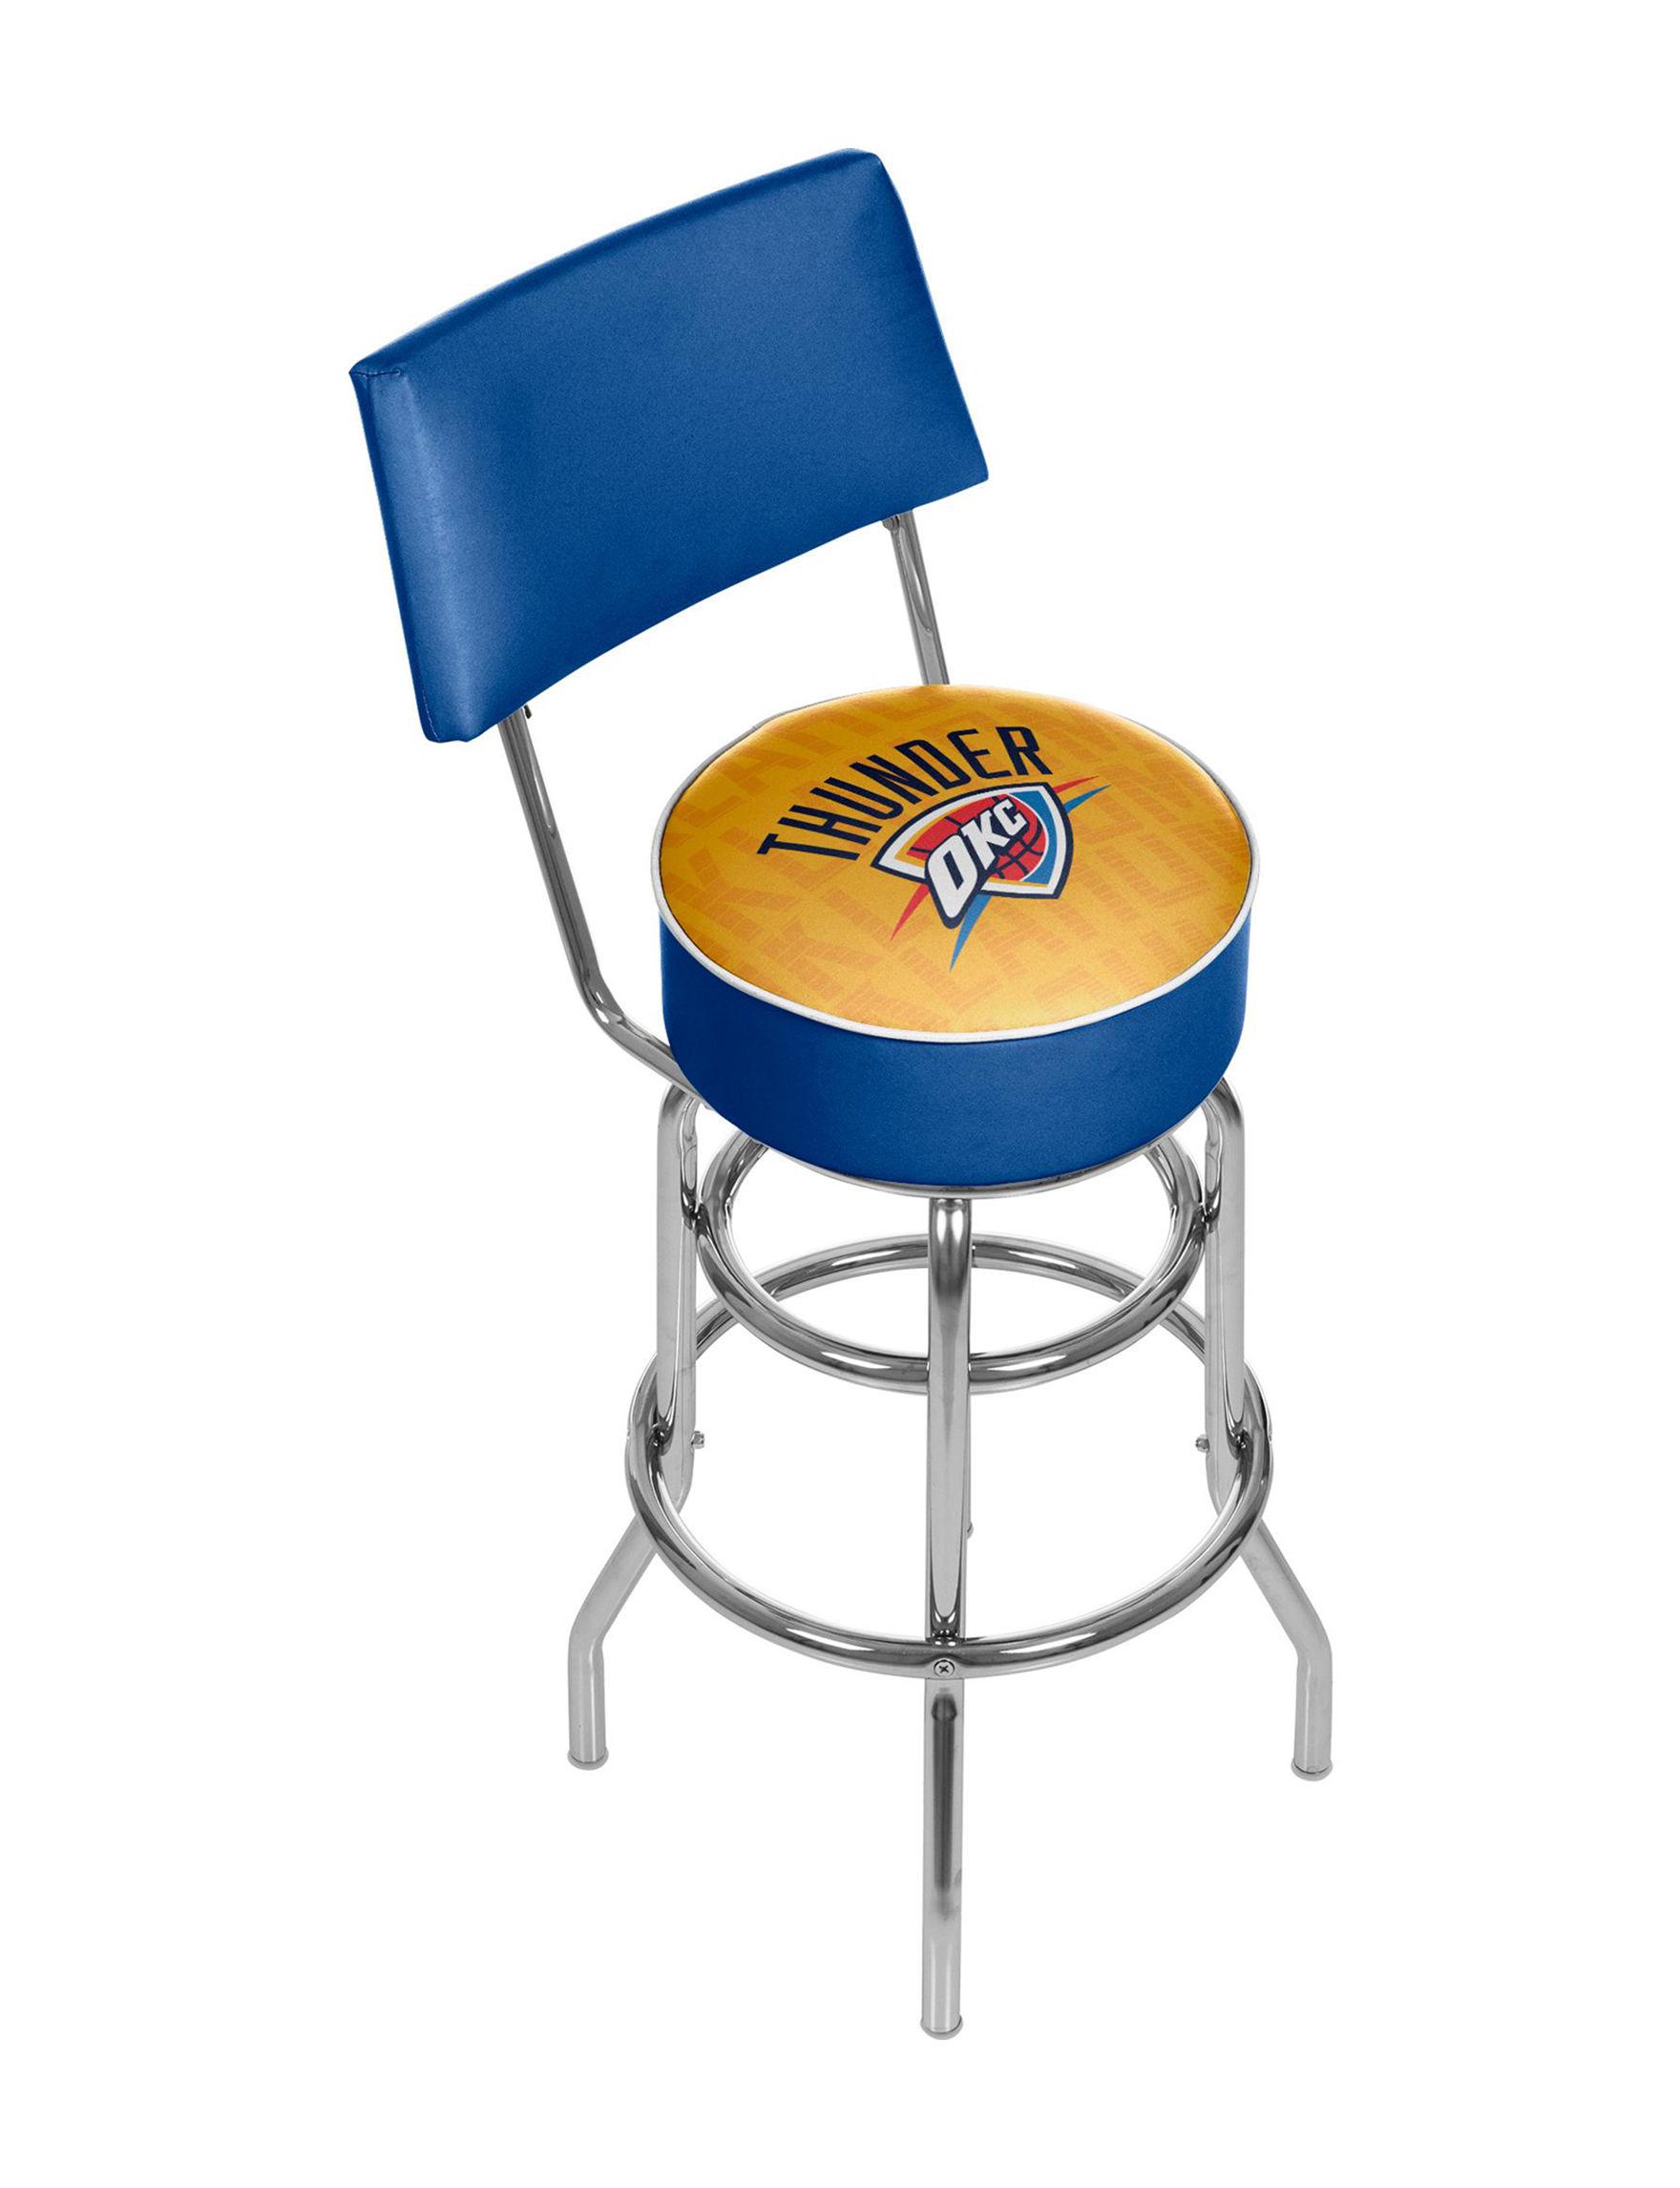 Trademark Global Blue / Yellow Bar & Kitchen Stools Game Room Kitchen & Dining Furniture